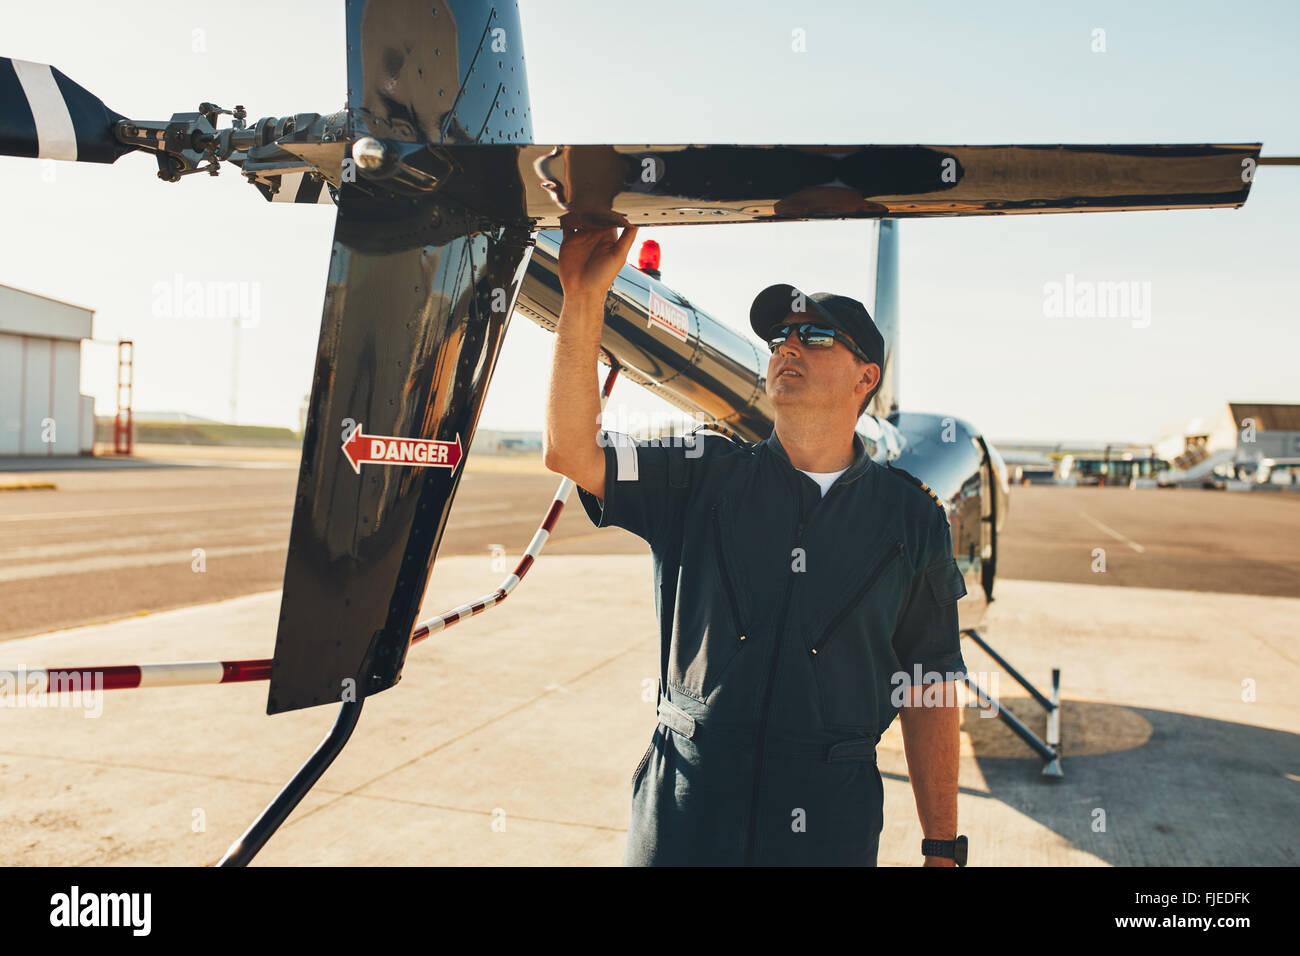 Hombres en uniforme de piloto de helicóptero de aleta trasera examinar. Inspección de pre vuelo por piloto Imagen De Stock